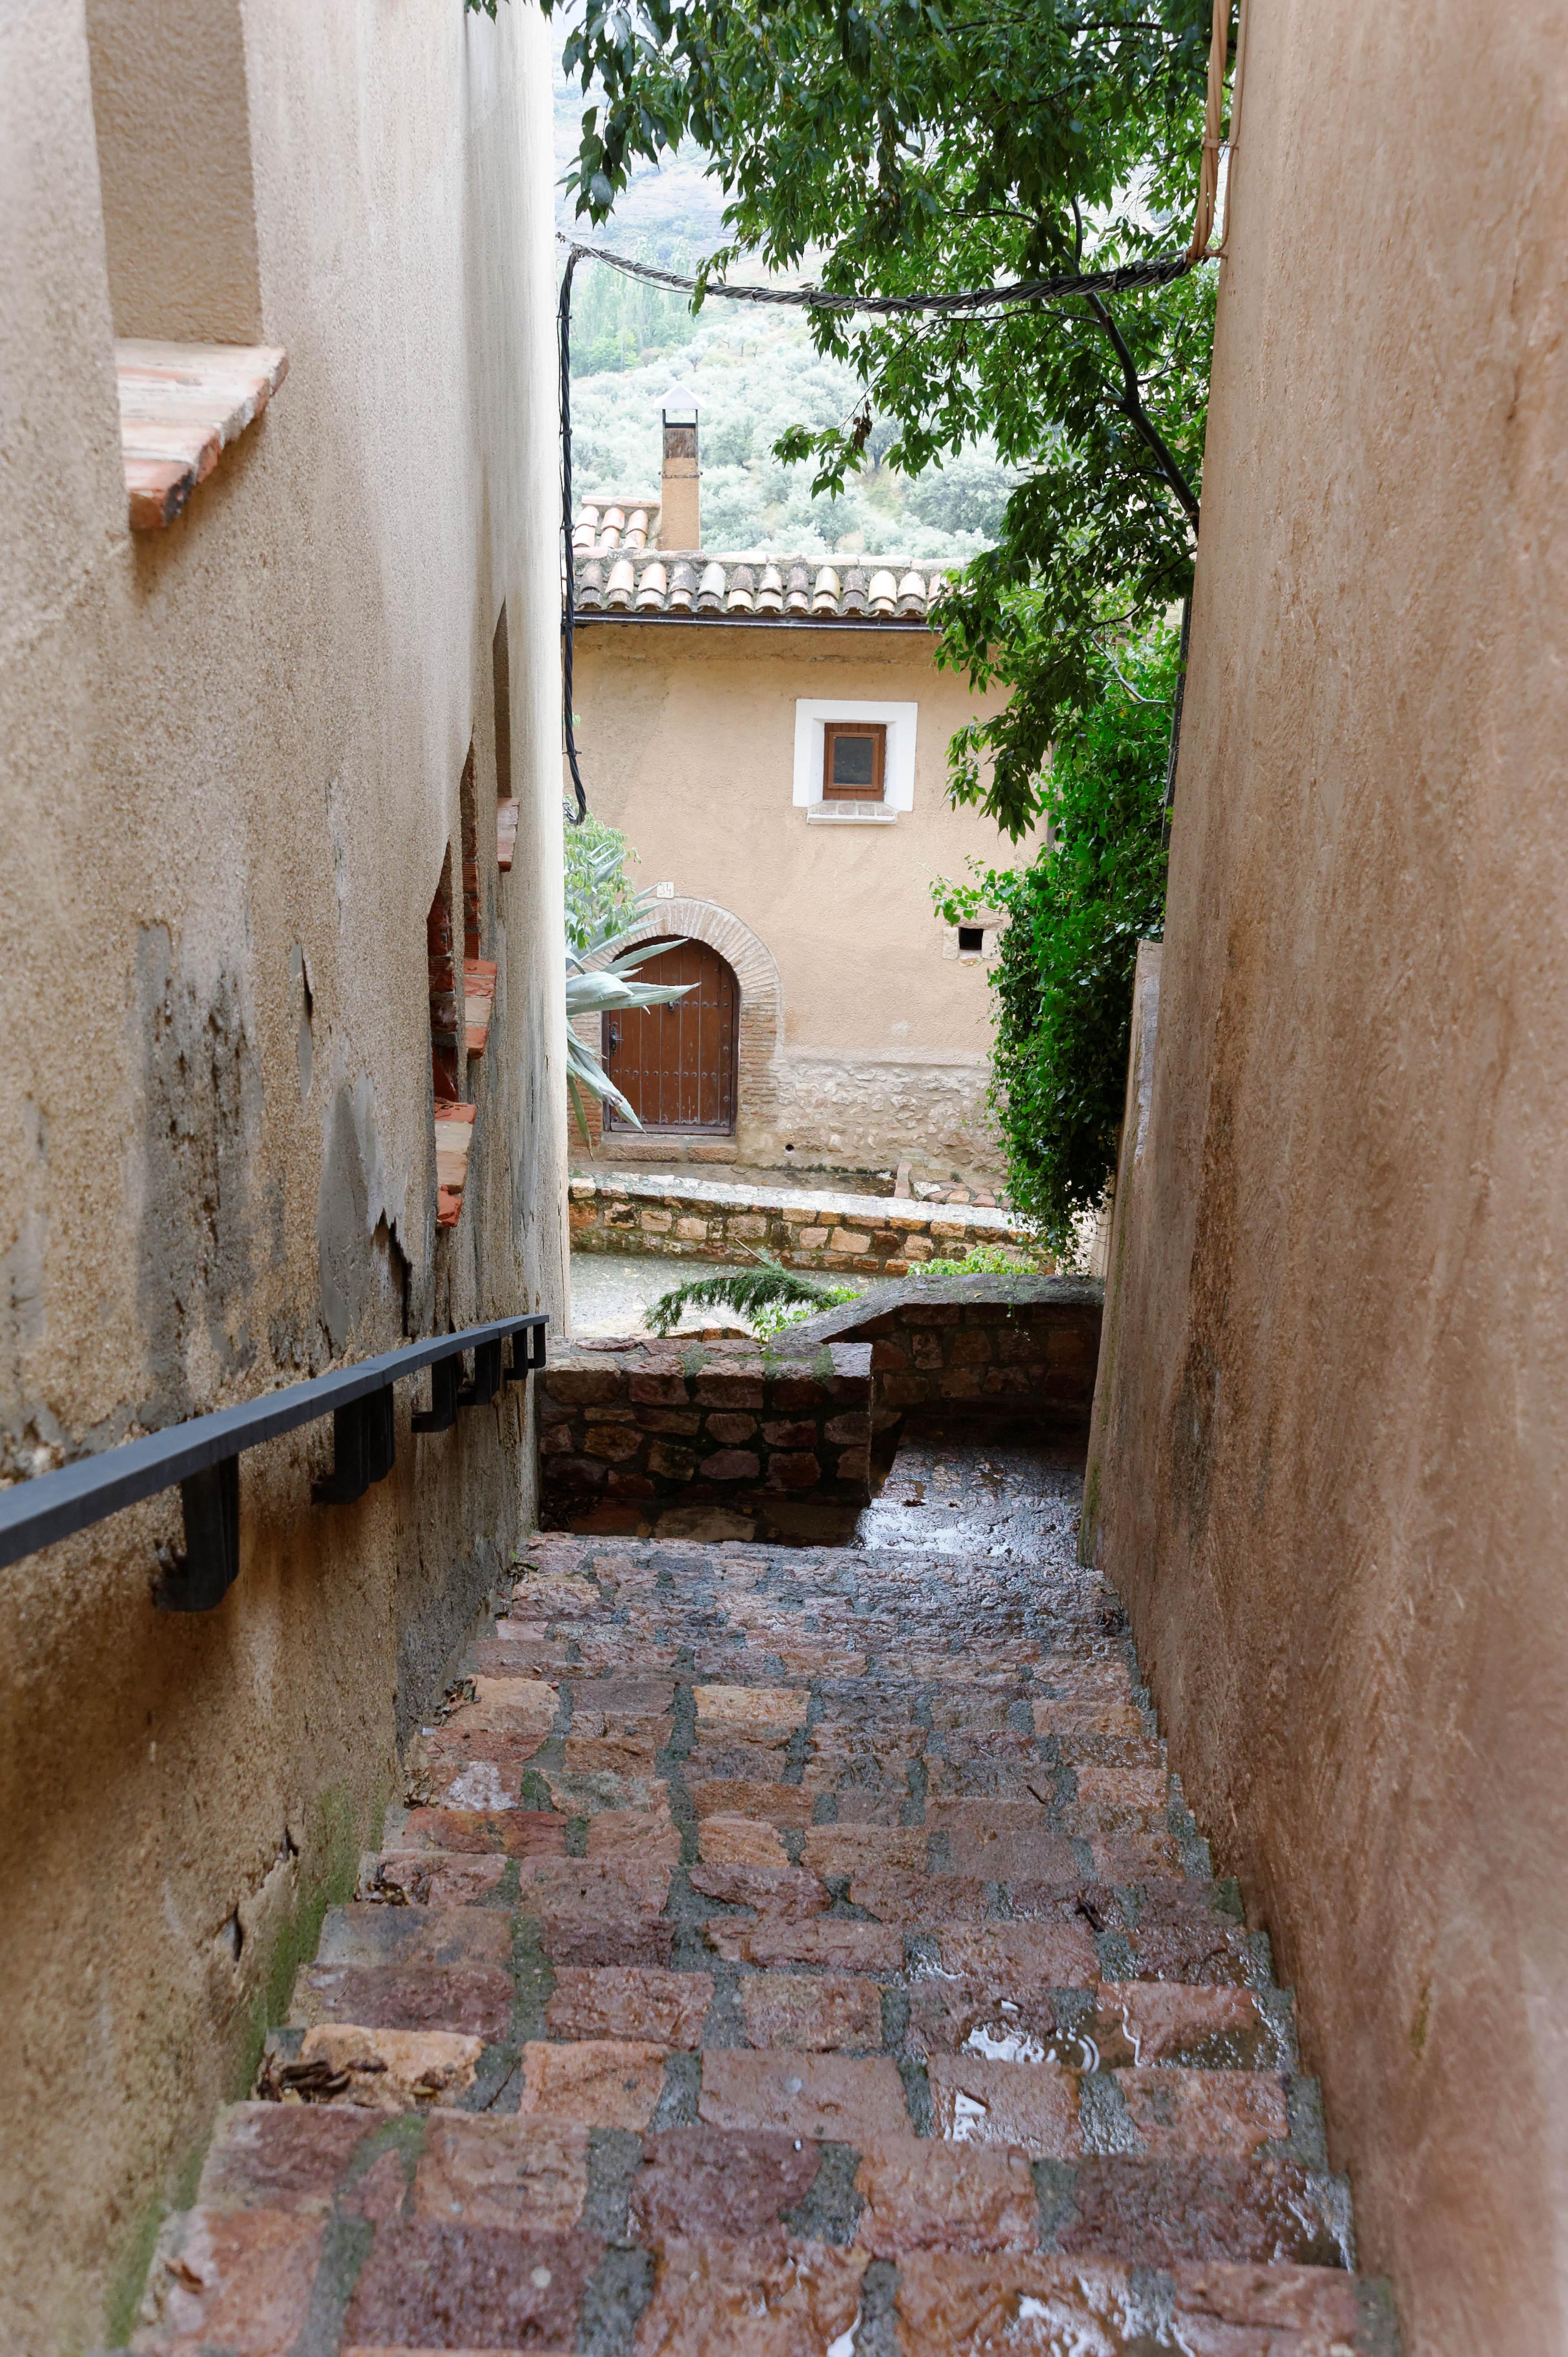 4289_Alquezar (Aragon)